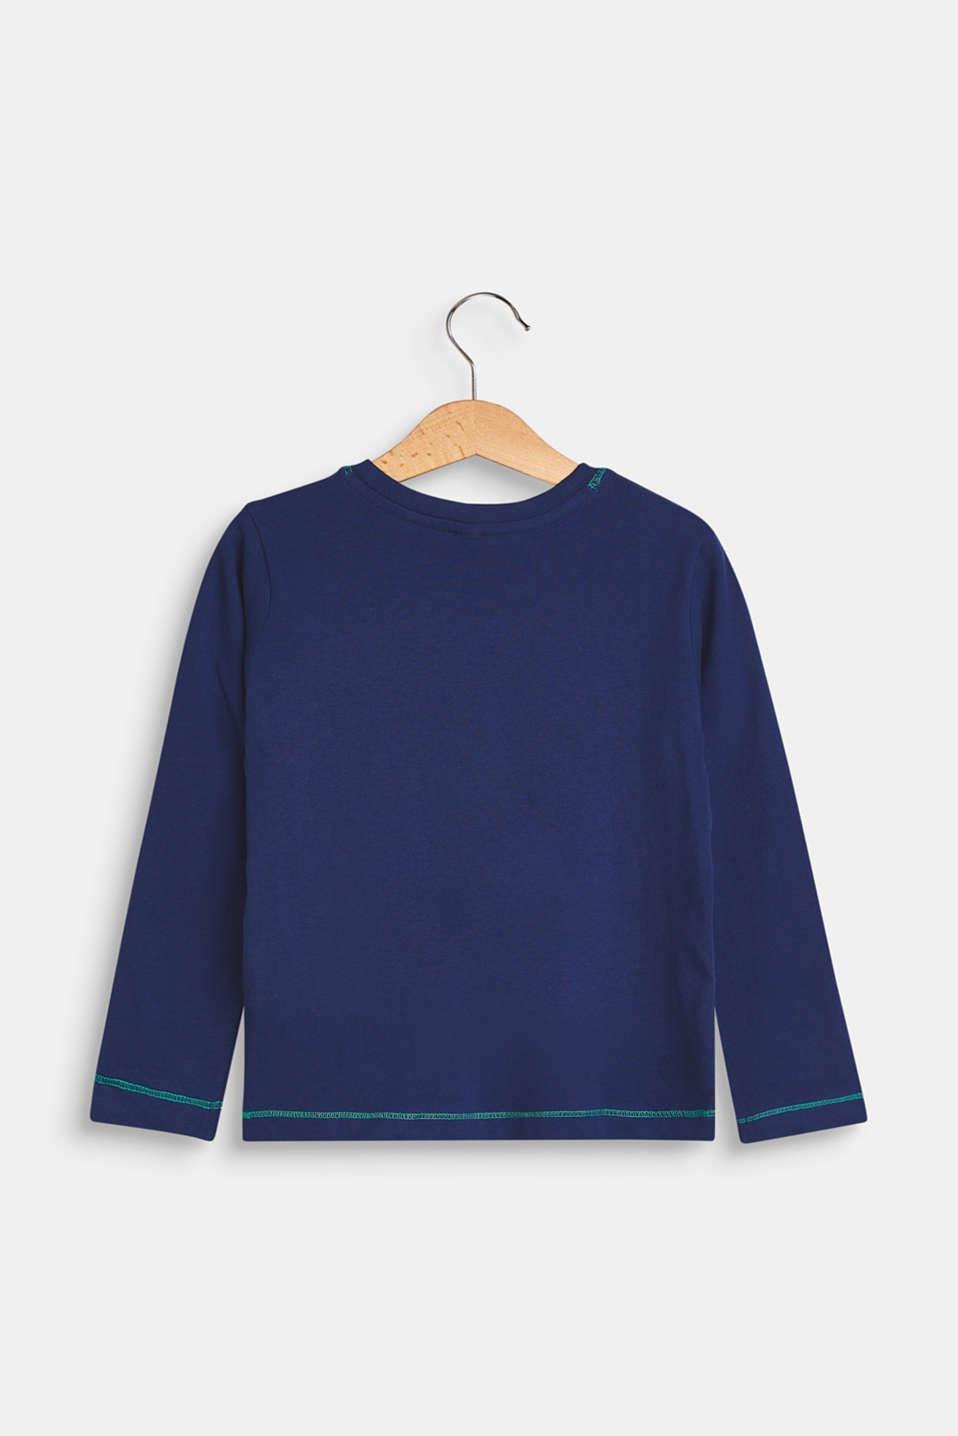 Melange long sleeve top with a statement print, MARINE BLUE, detail image number 1